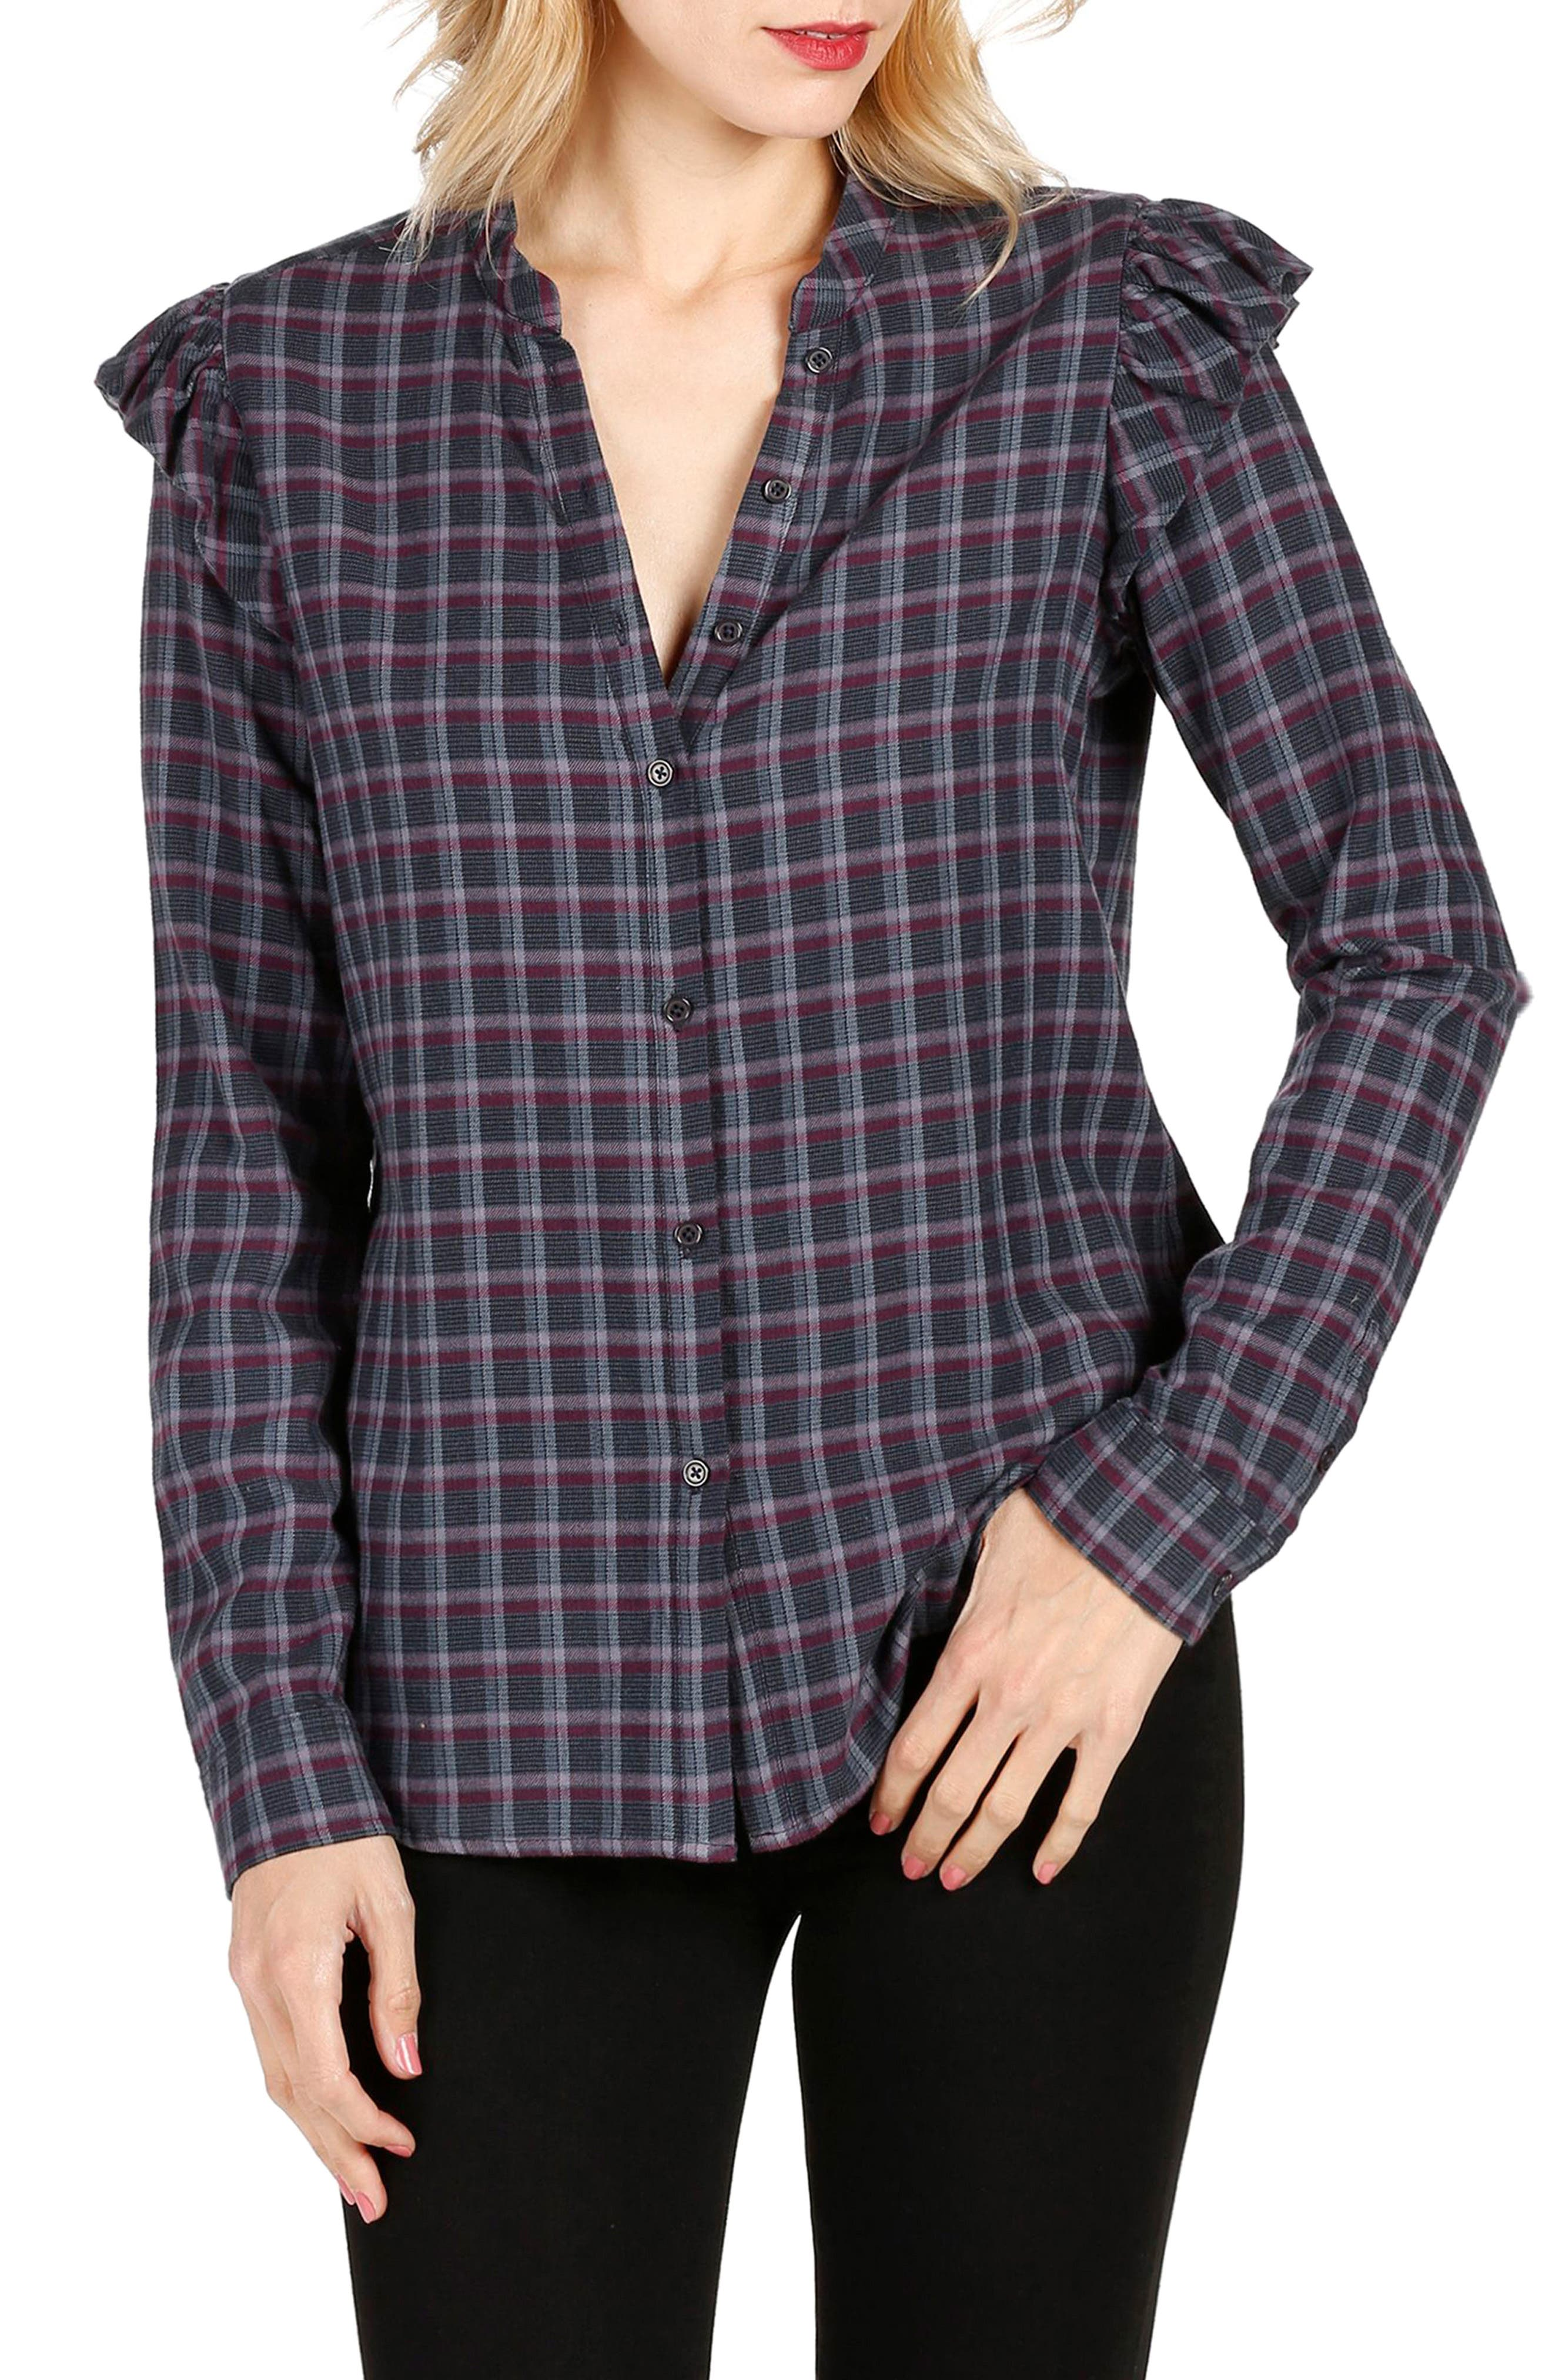 Jenelle Ruffle Plaid Shirt,                         Main,                         color, 460